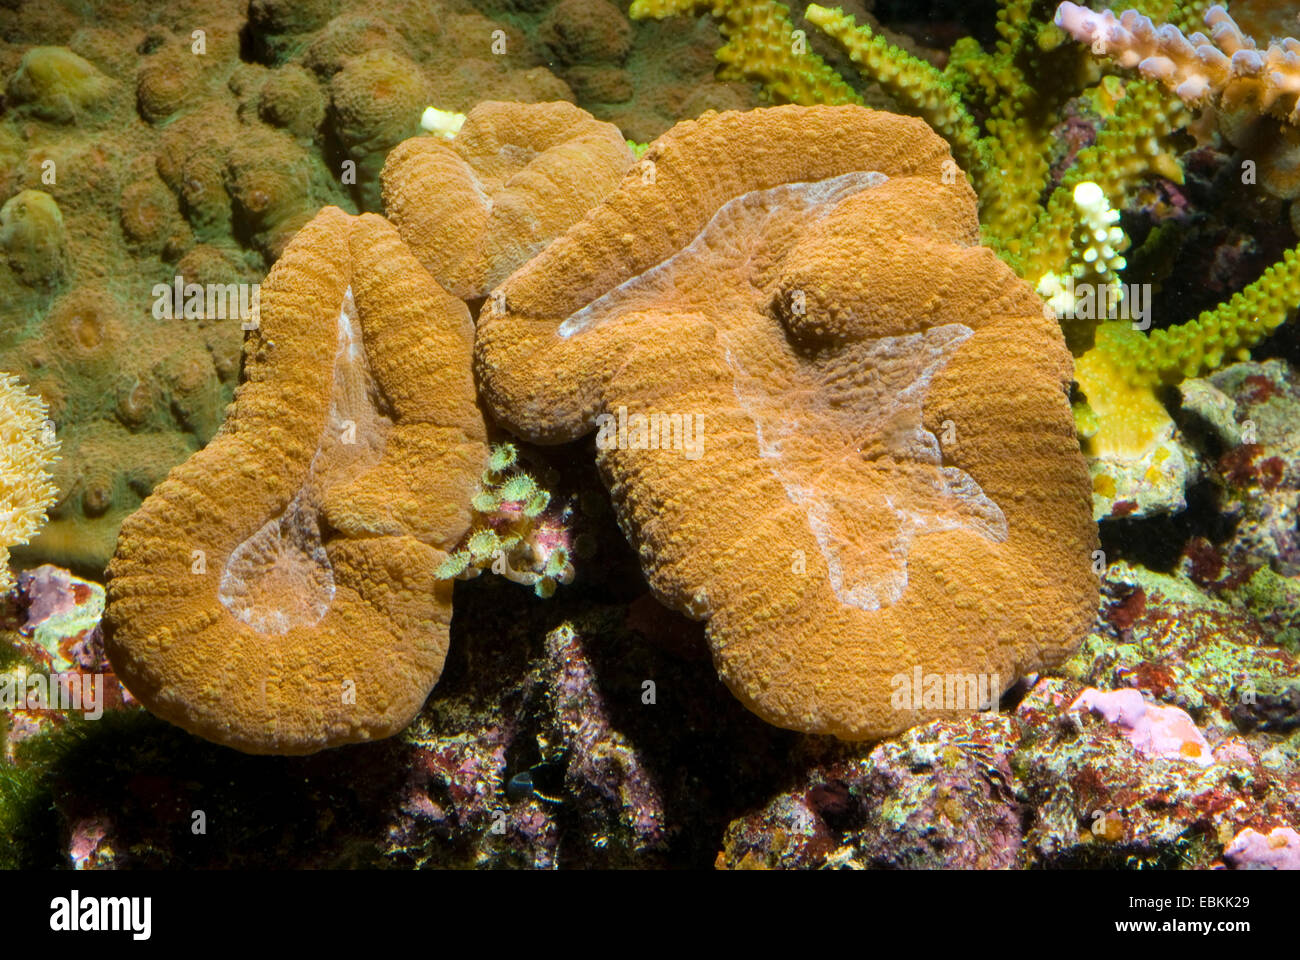 Coral Cerebro plana (Lobophyllia hemprichii), vista lateral Imagen De Stock